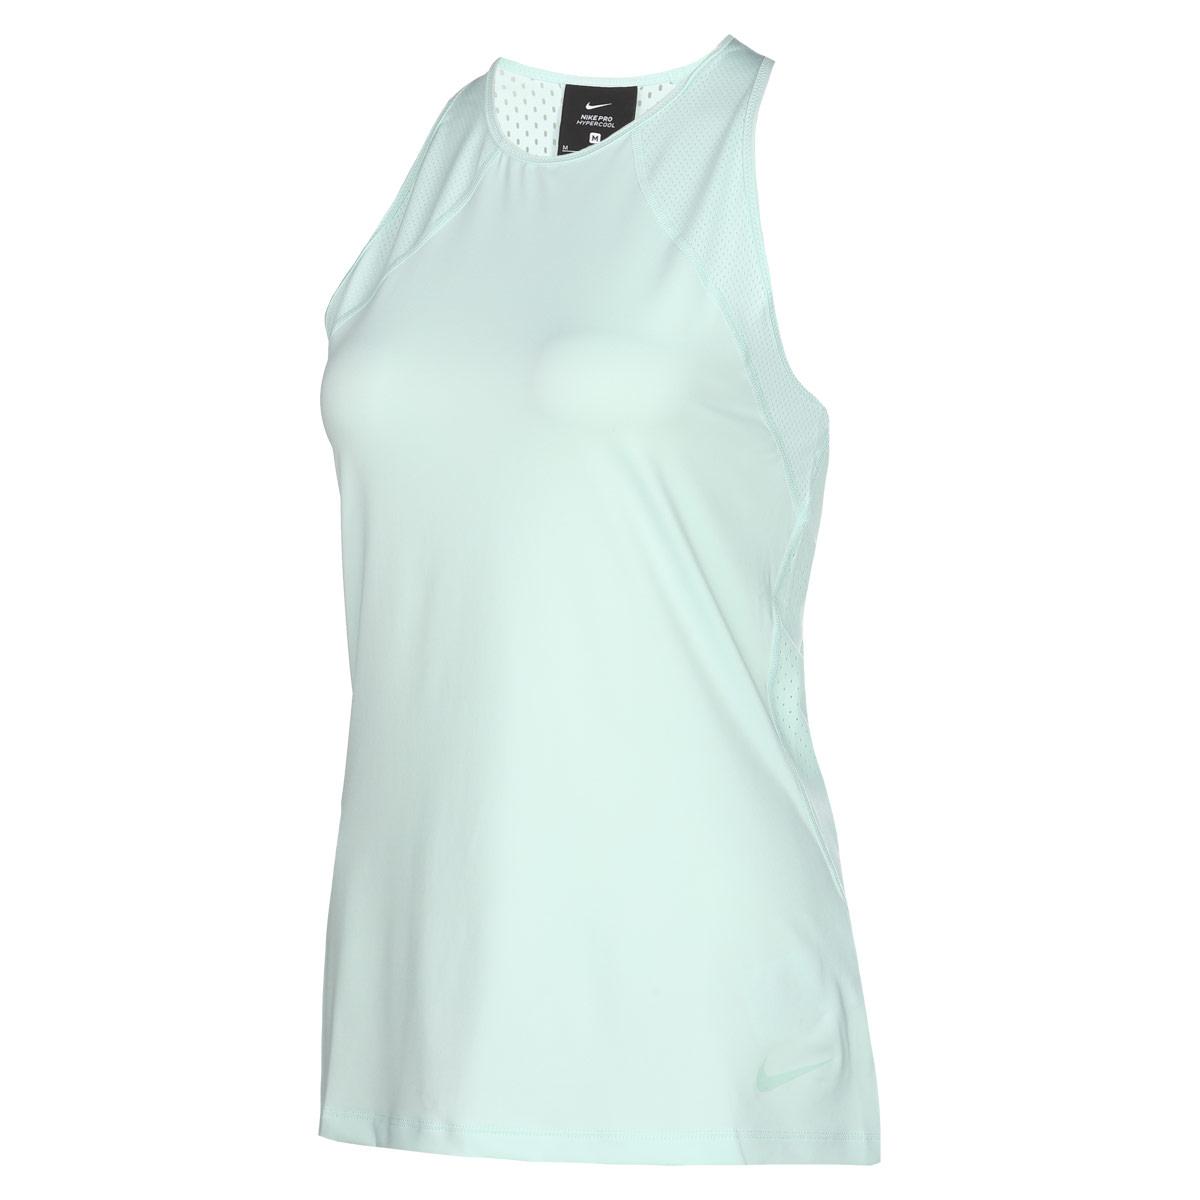 De Pro Tank Hypercool Nike Fitness Camisetas Para Azul Mujer 3jLScR54Aq